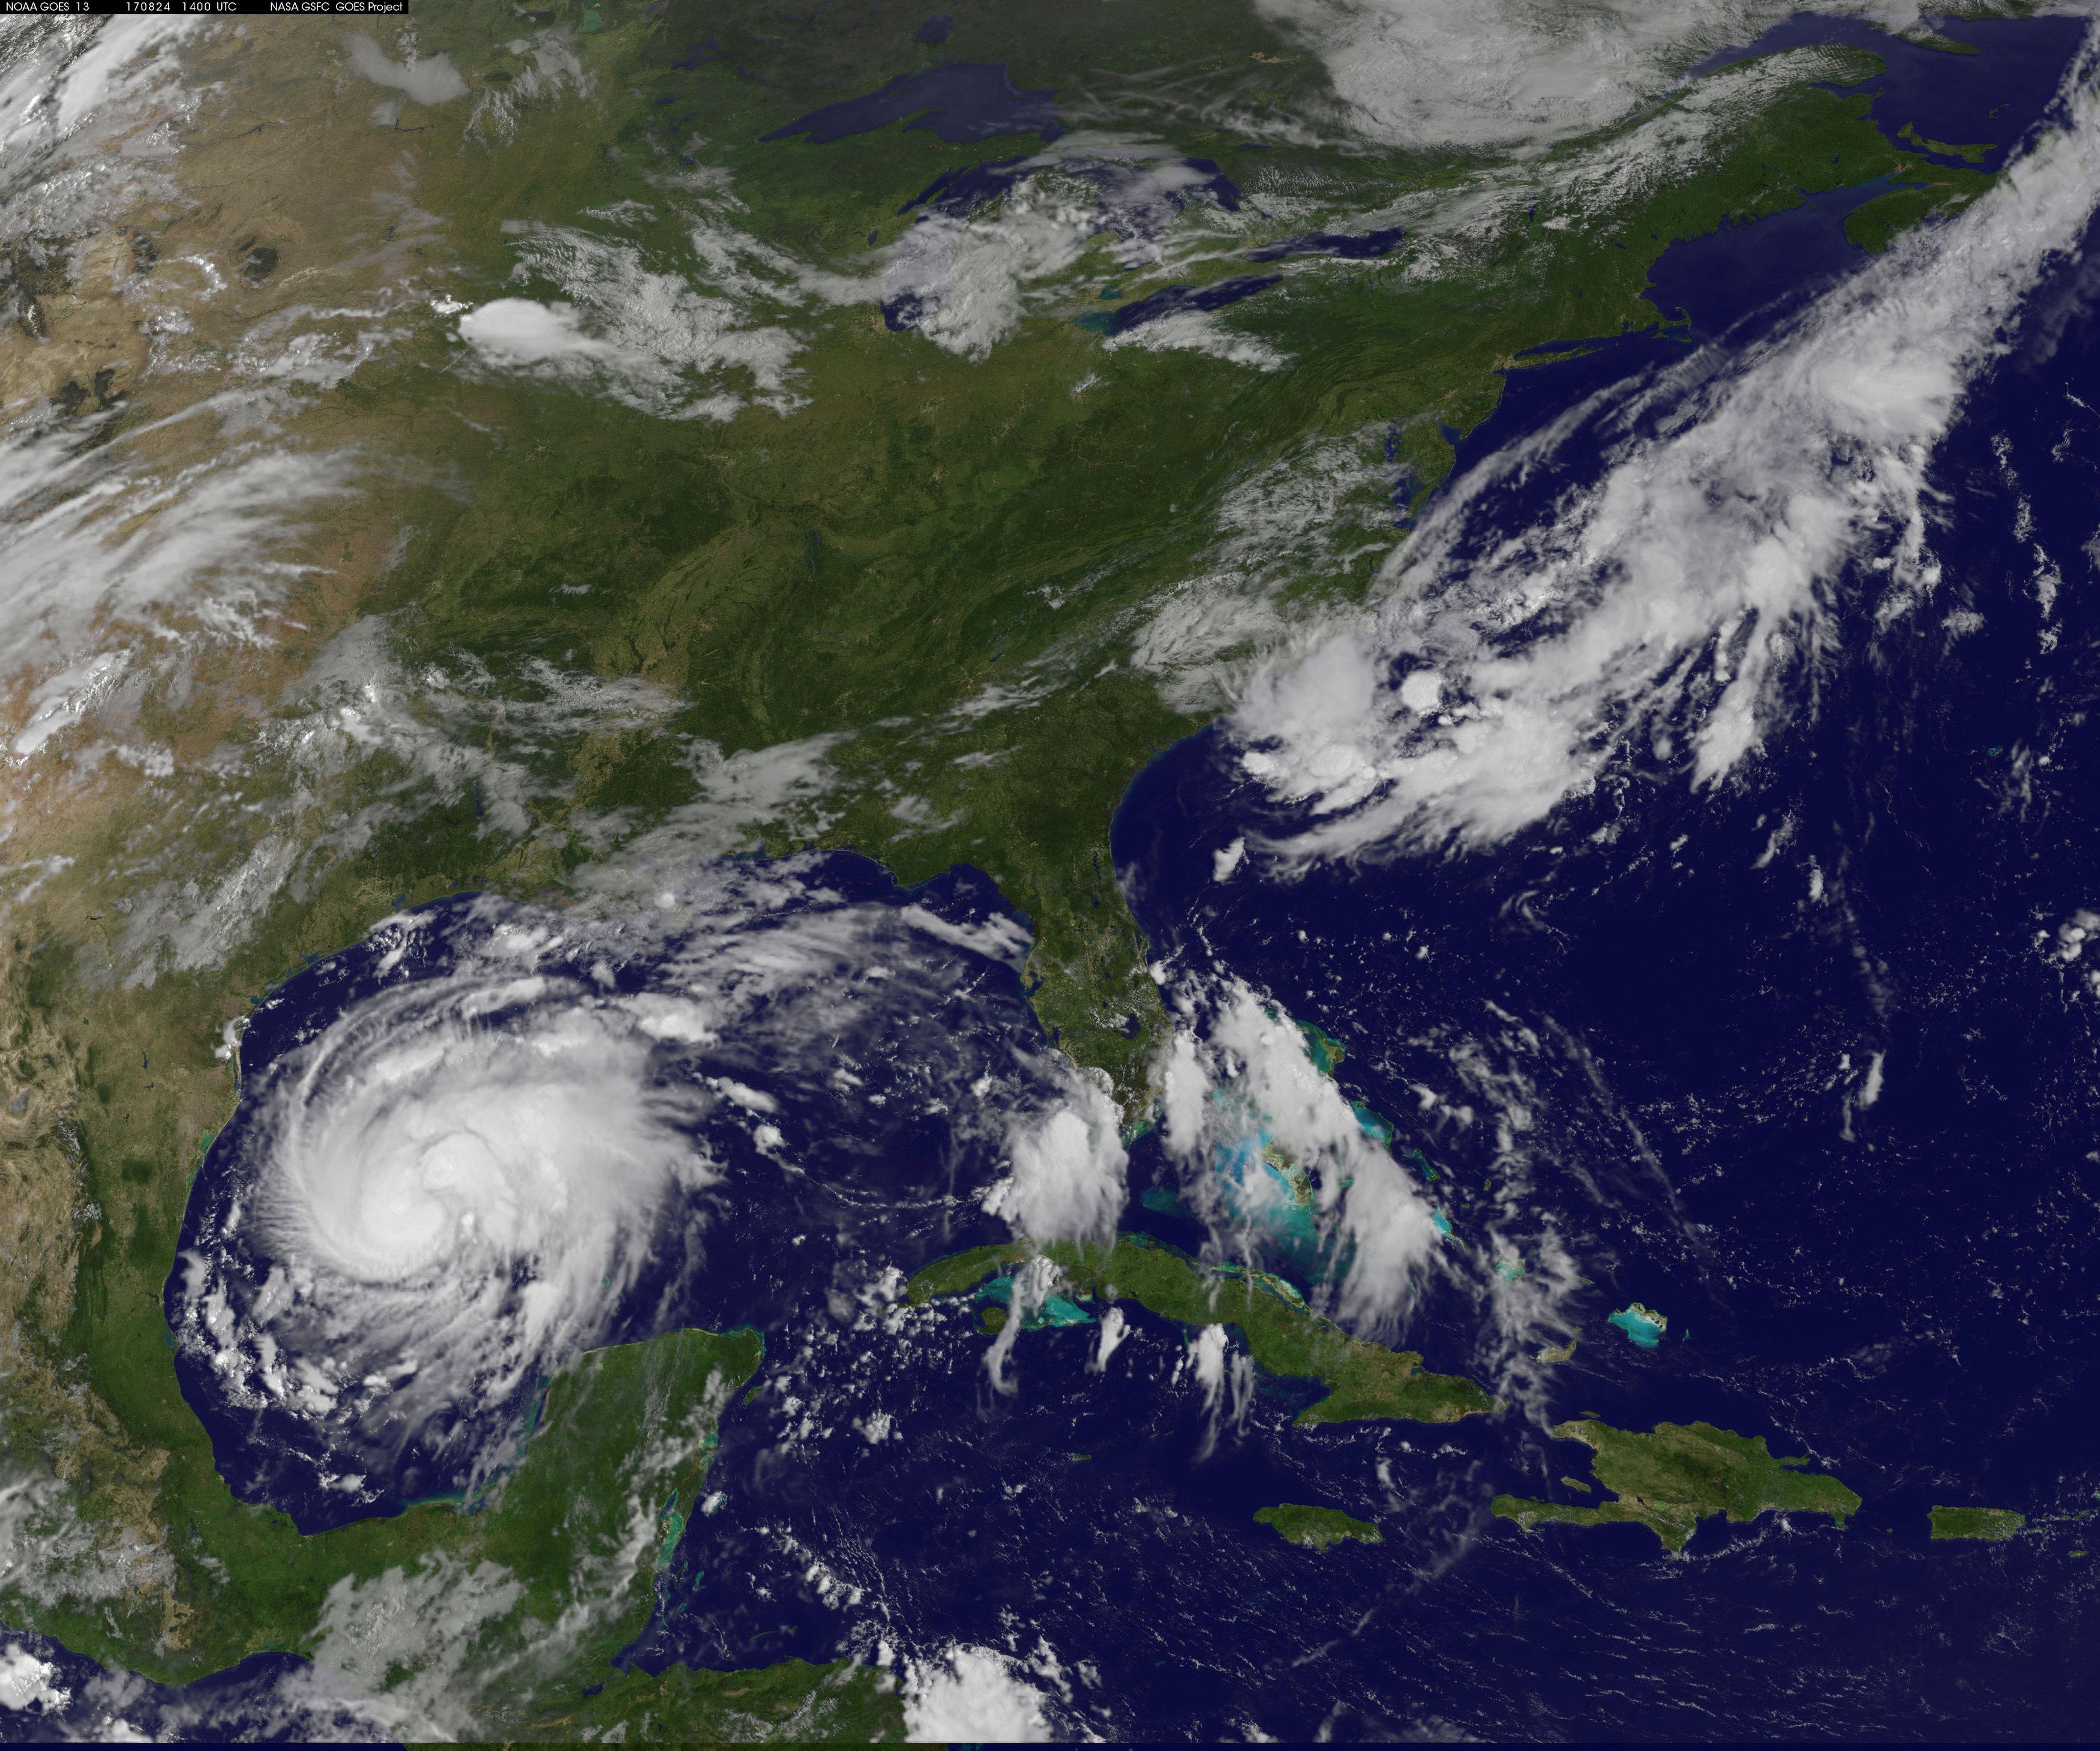 Tropical Storm Harvey approaching the Texas Gulf Coast. (NOAA/via Reuters)